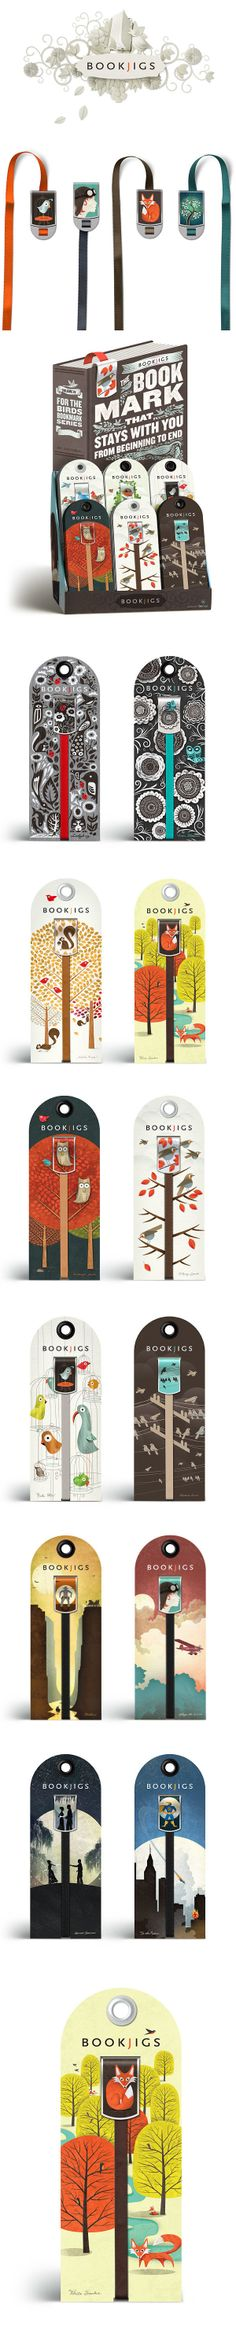 Bookjigs By: Russ Grey #book #package #design